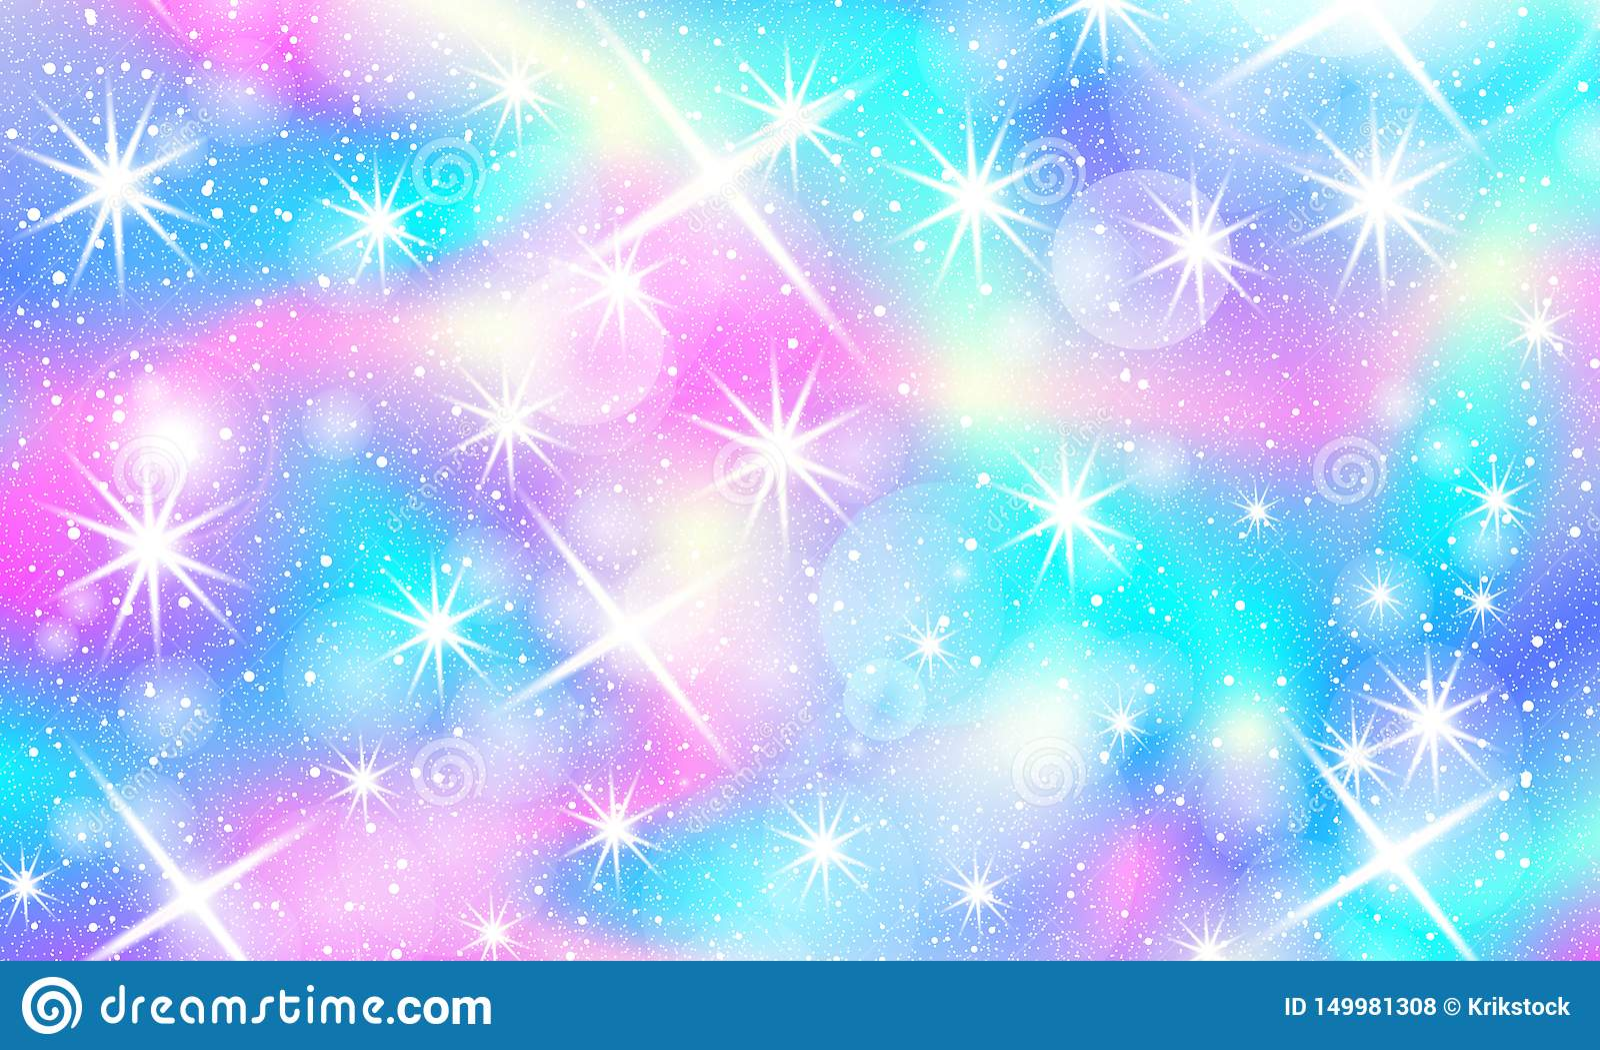 Rainbow Mermaid Background Unicorn Pattern Stock Vector Illustration Of Colorful Kawaii 149981308